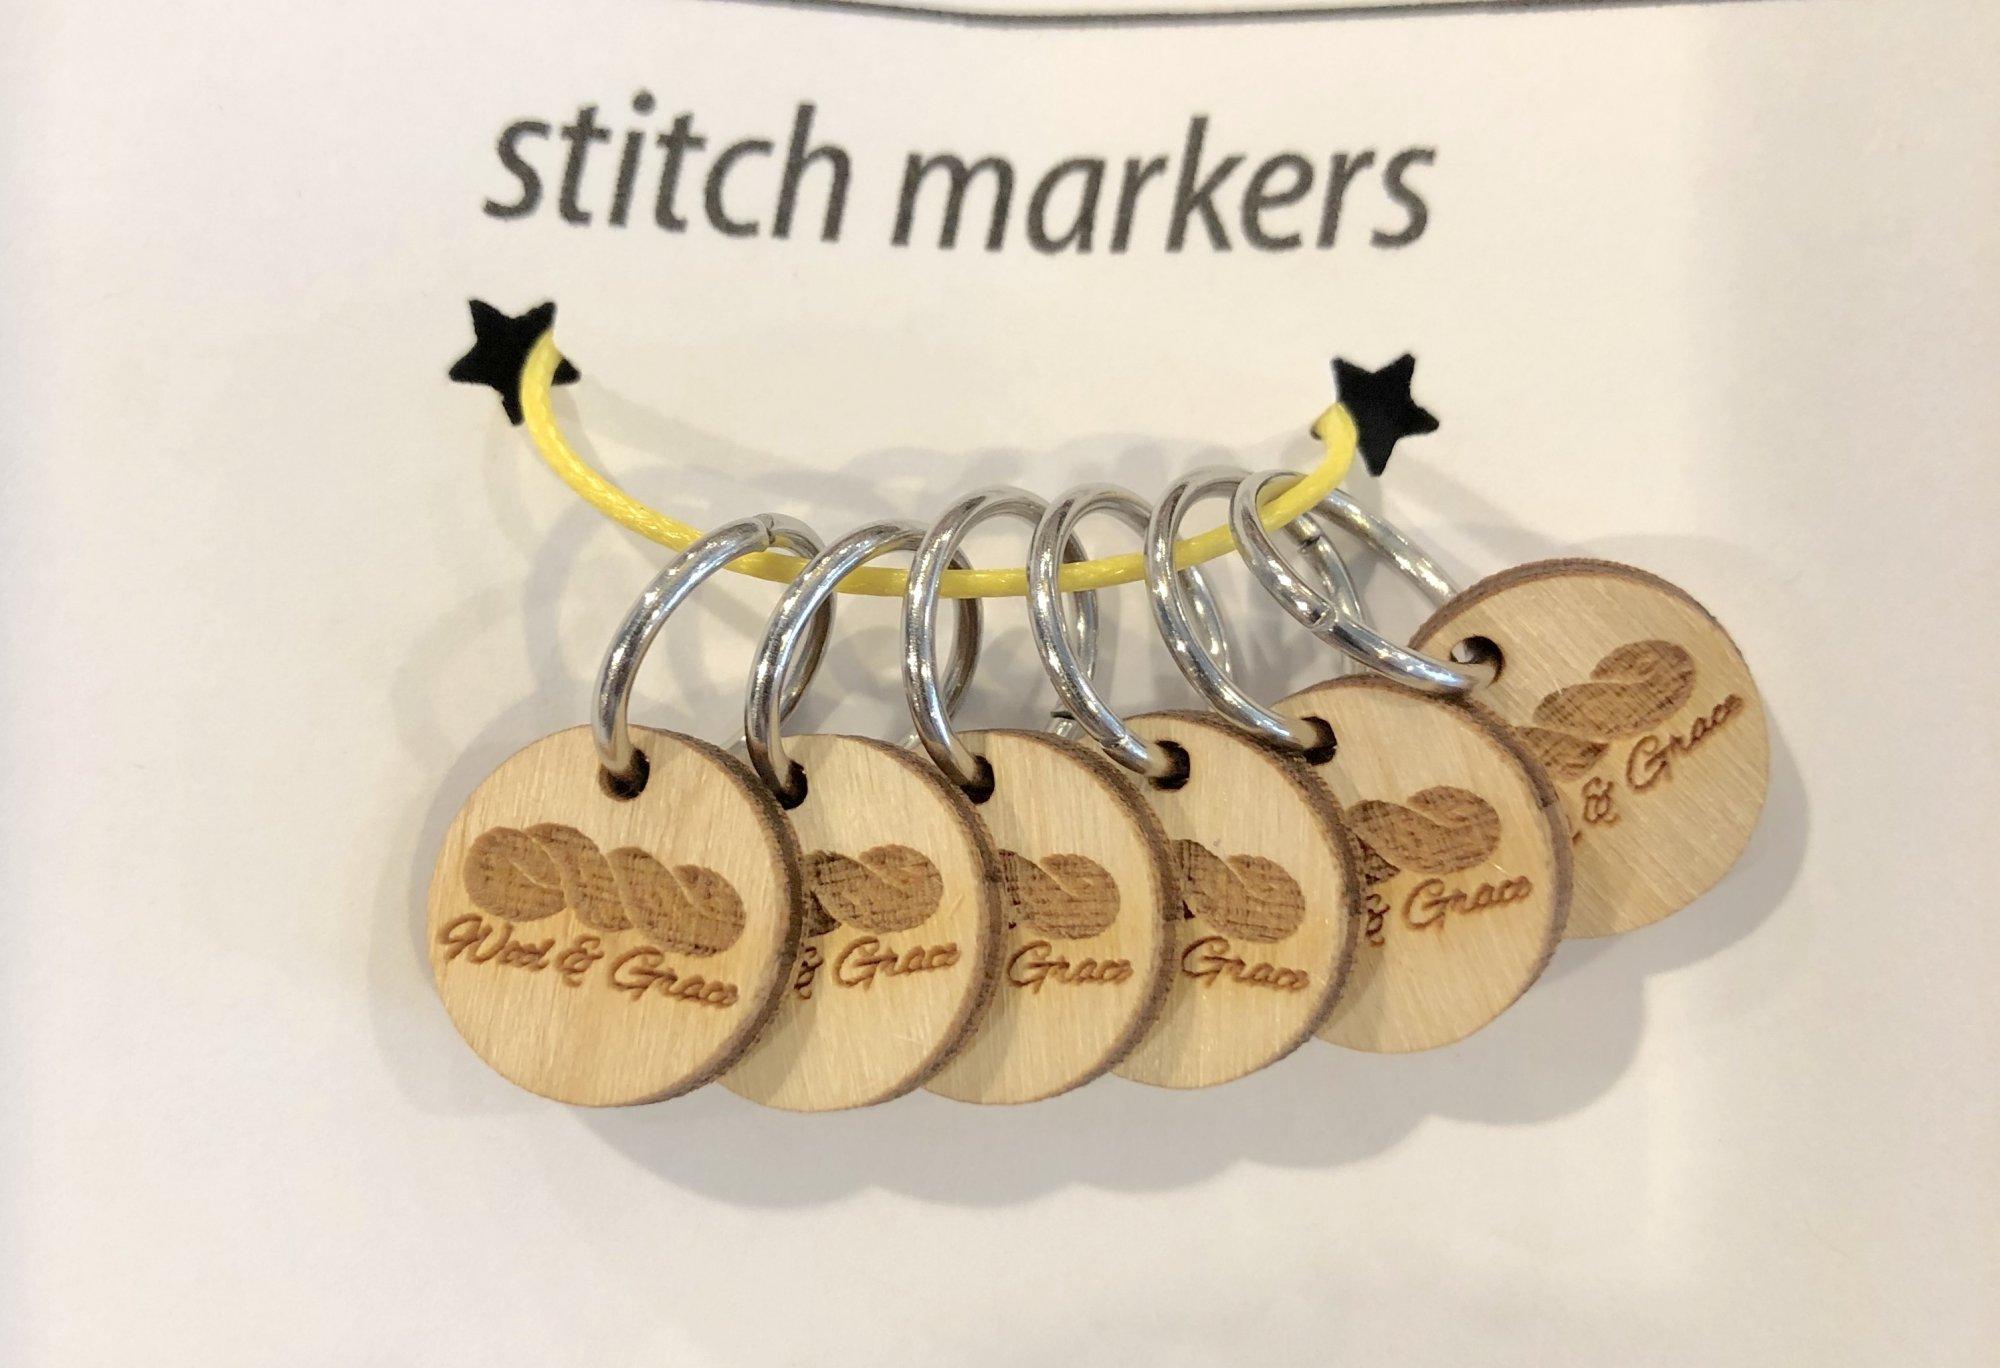 W&G Ring Stitch Marker Set